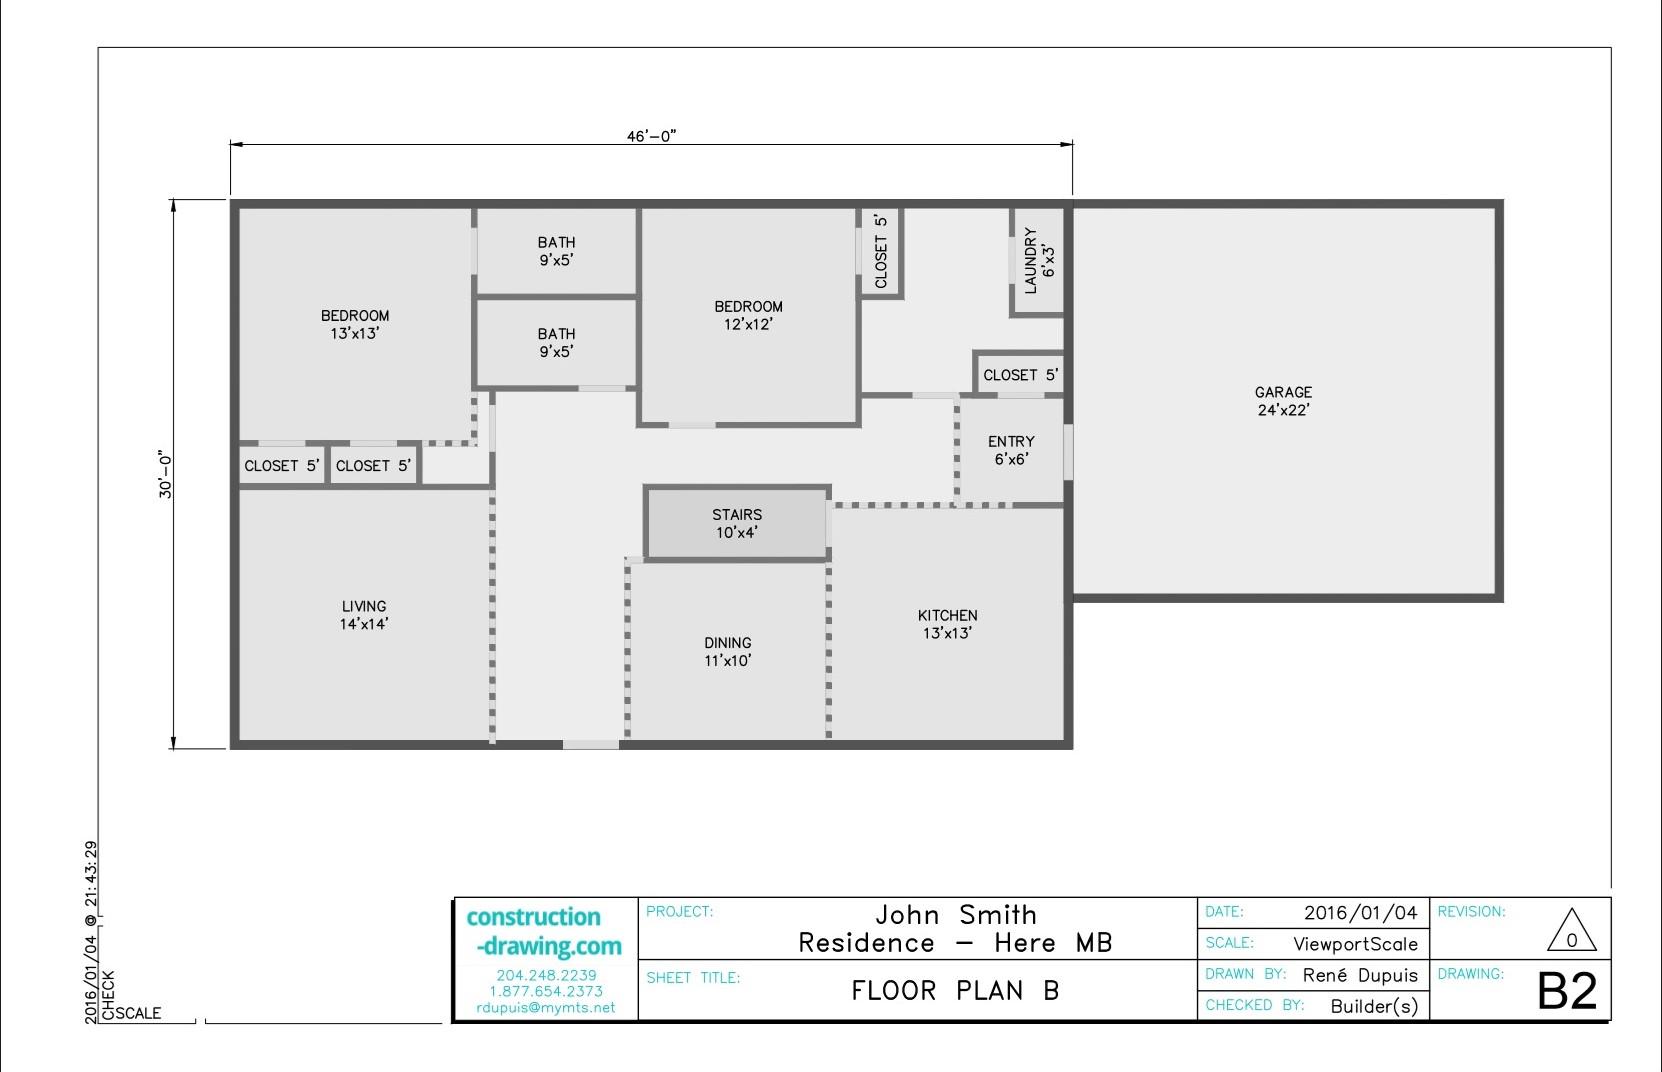 Custom Floor Plans - Construction-Drawing.com